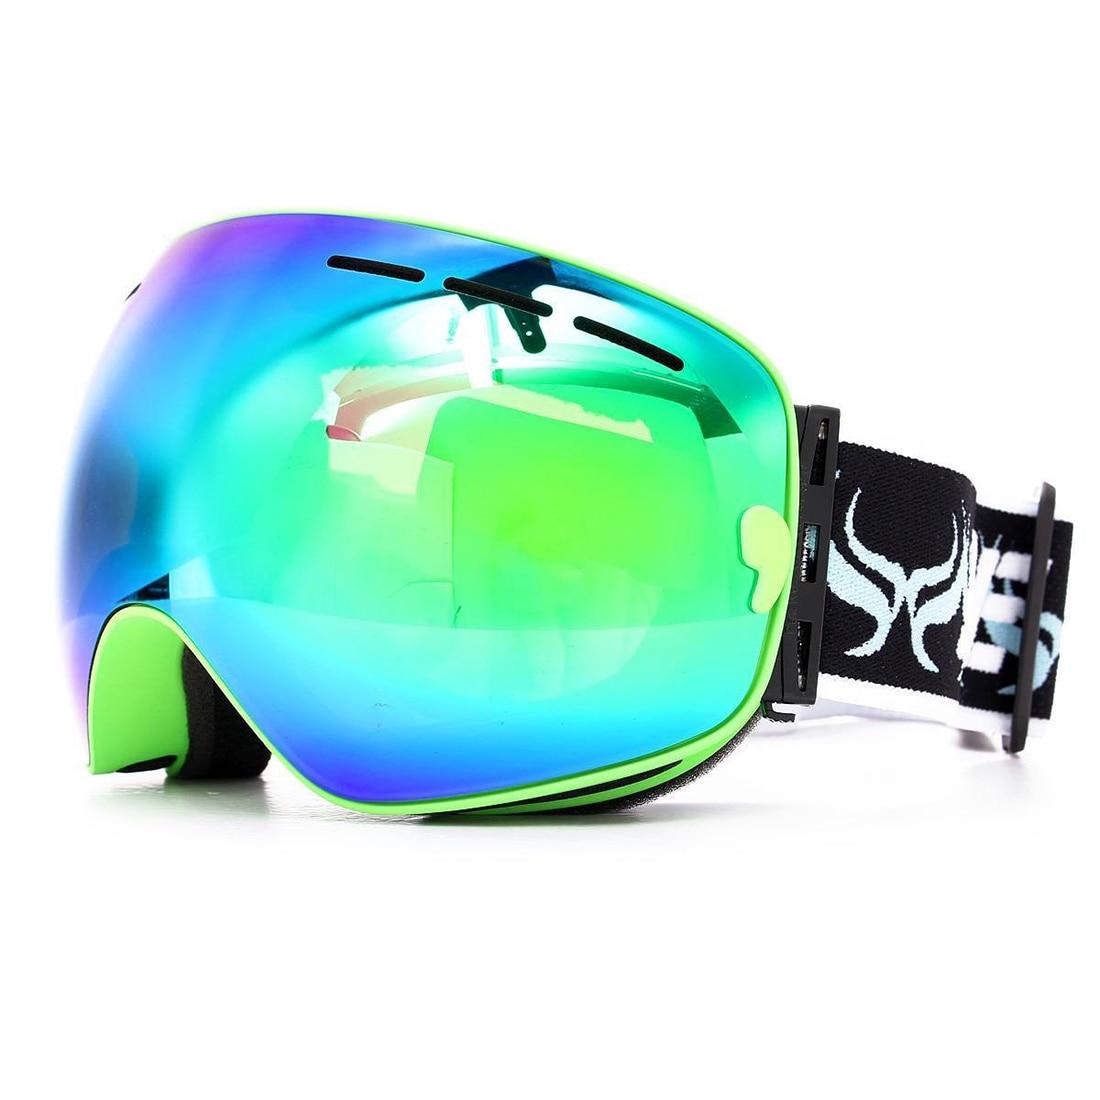 BENICE ski goggles double layer anti-fog eyes green frame